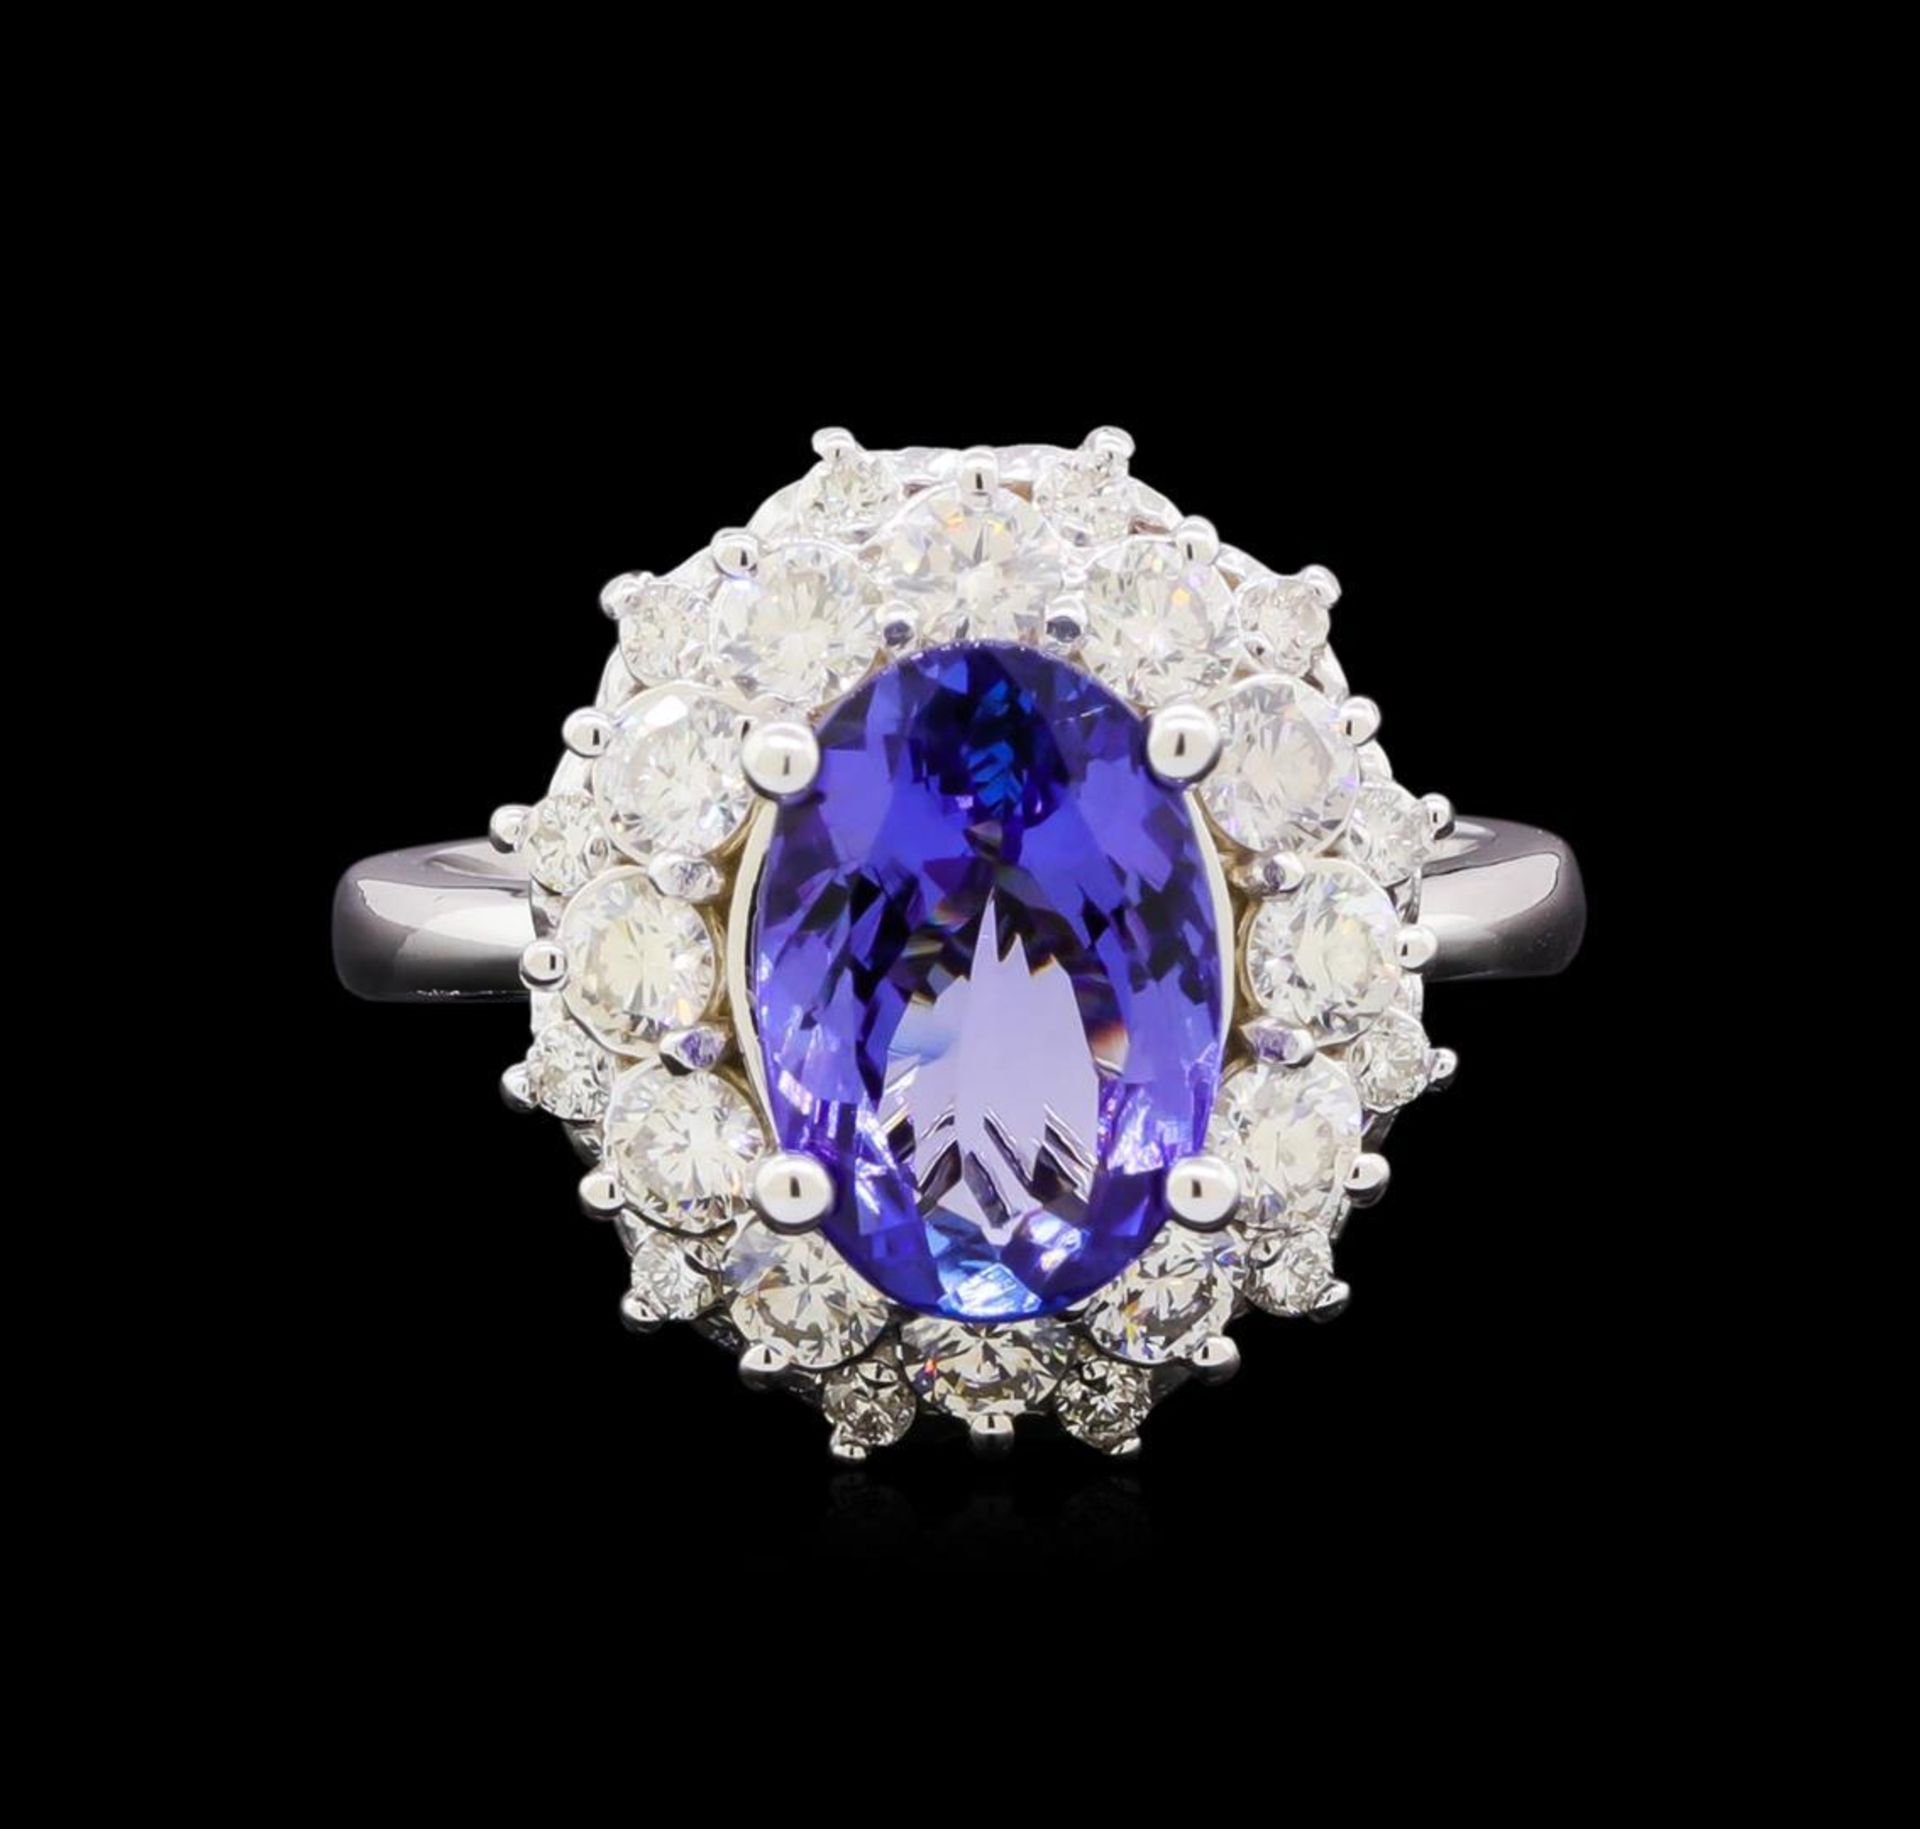 3.23 ctw Tanzanite and Diamond Ring - 14KT White Gold - Image 2 of 5